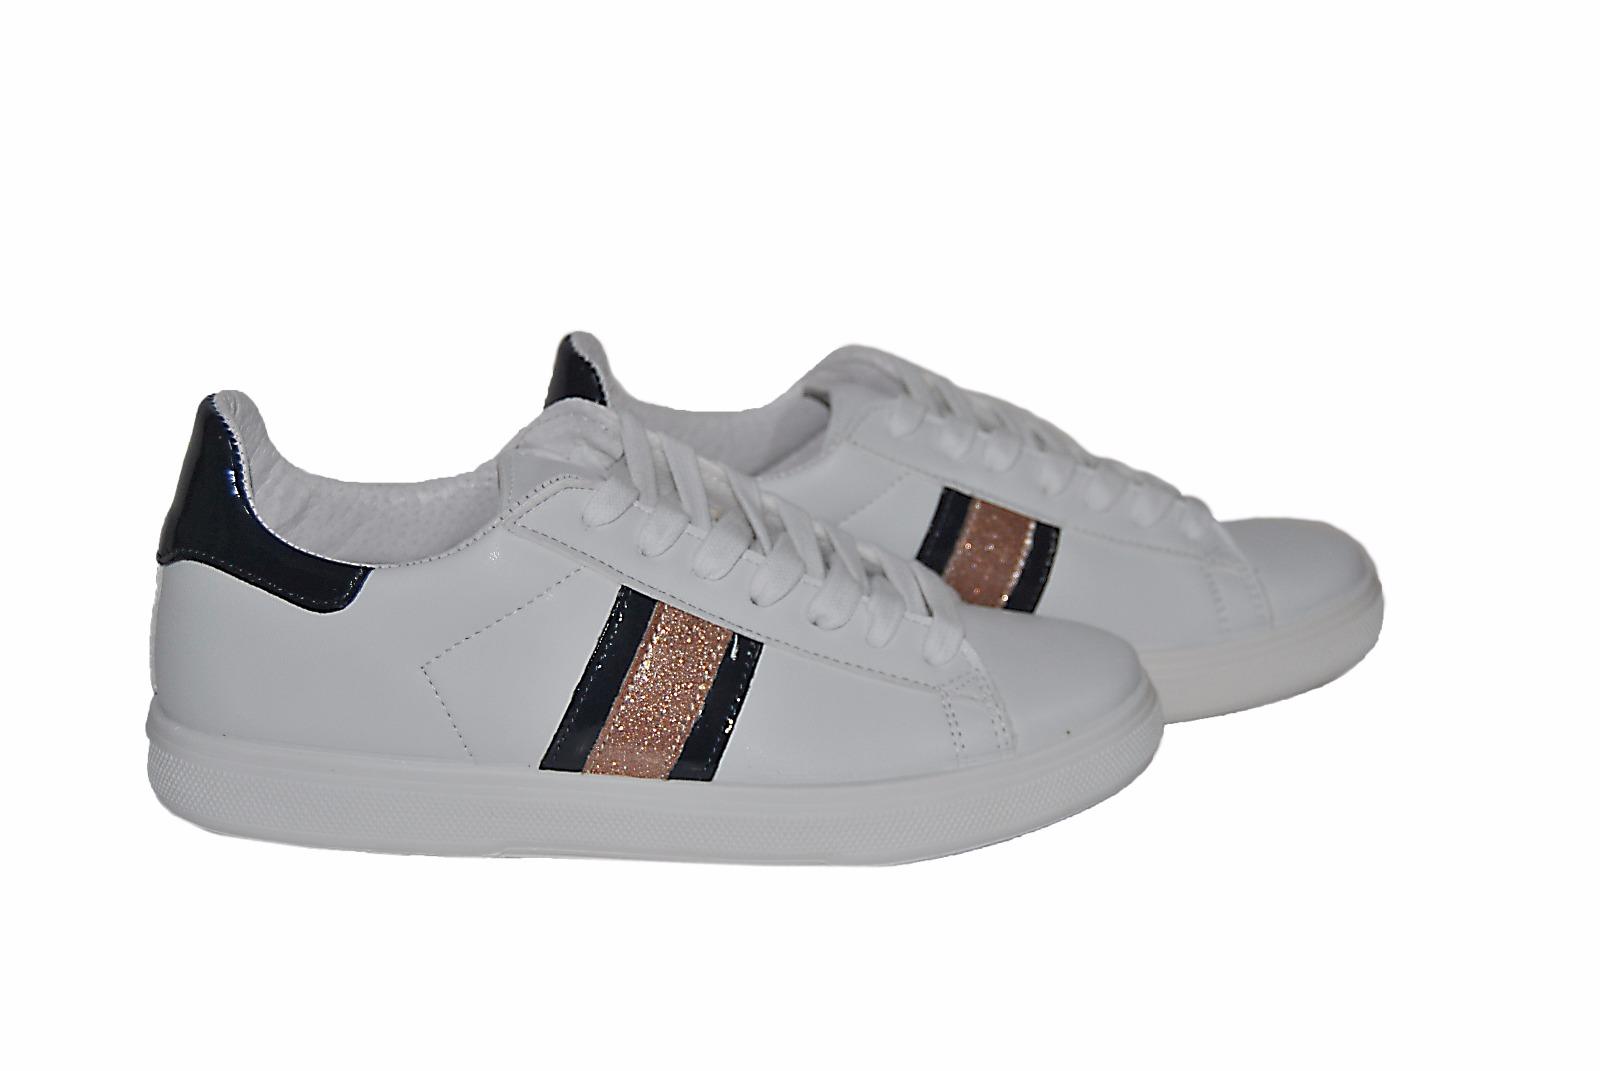 0fa8cd94ce88 ... scarpe sneakers basse donna pelle bianca fascia vernice blu rosa Arish  Nuovo ...